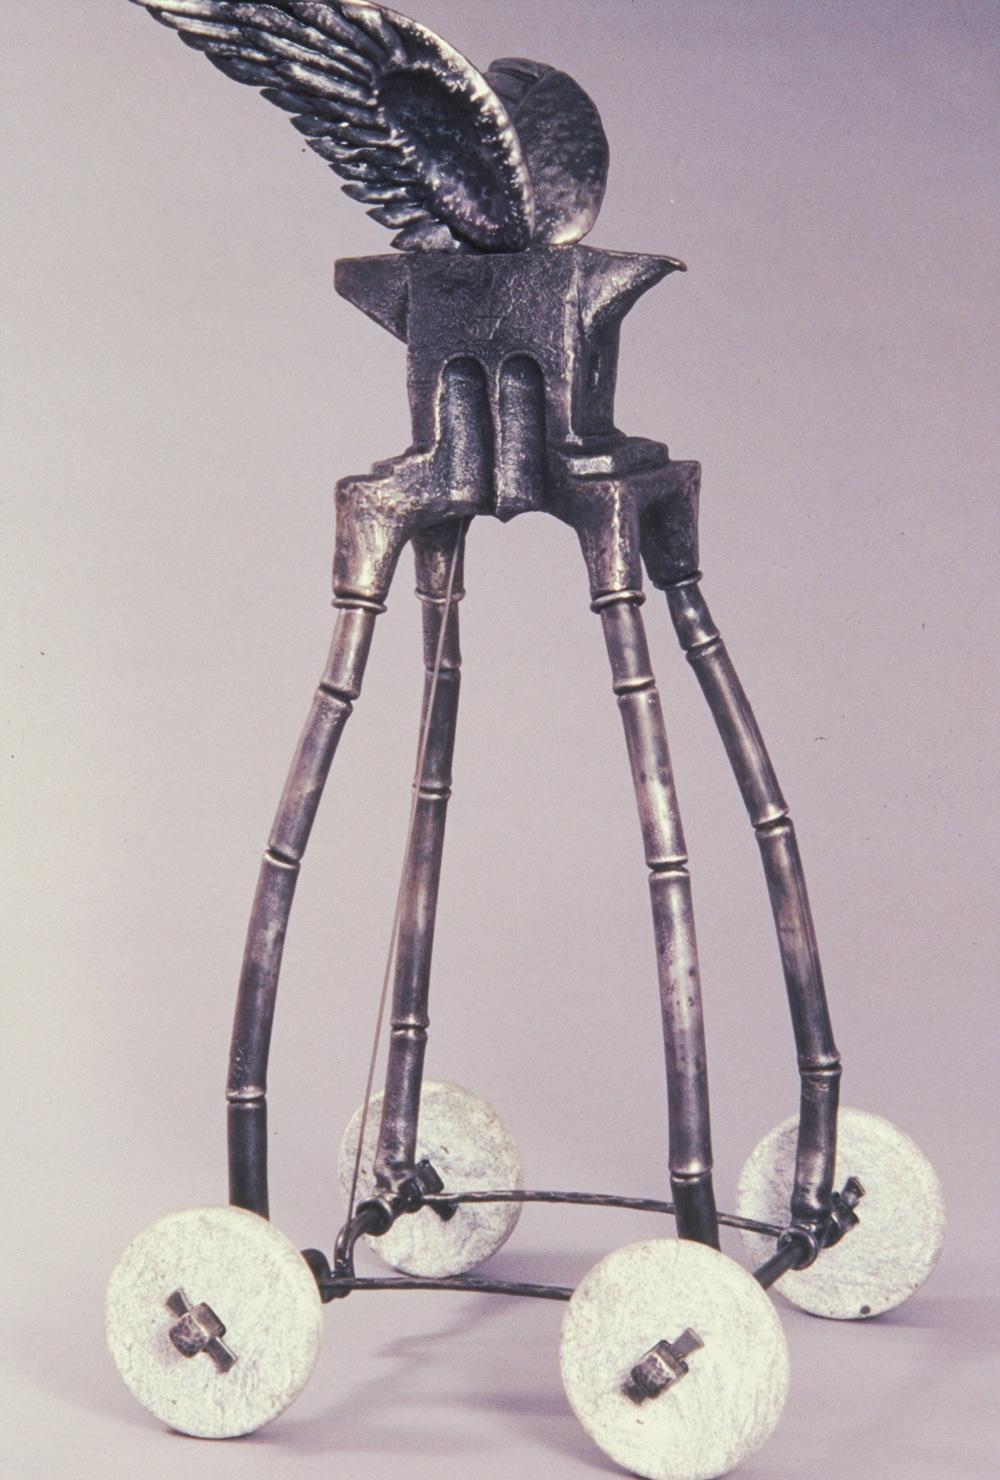 Copy of Movement, 2003